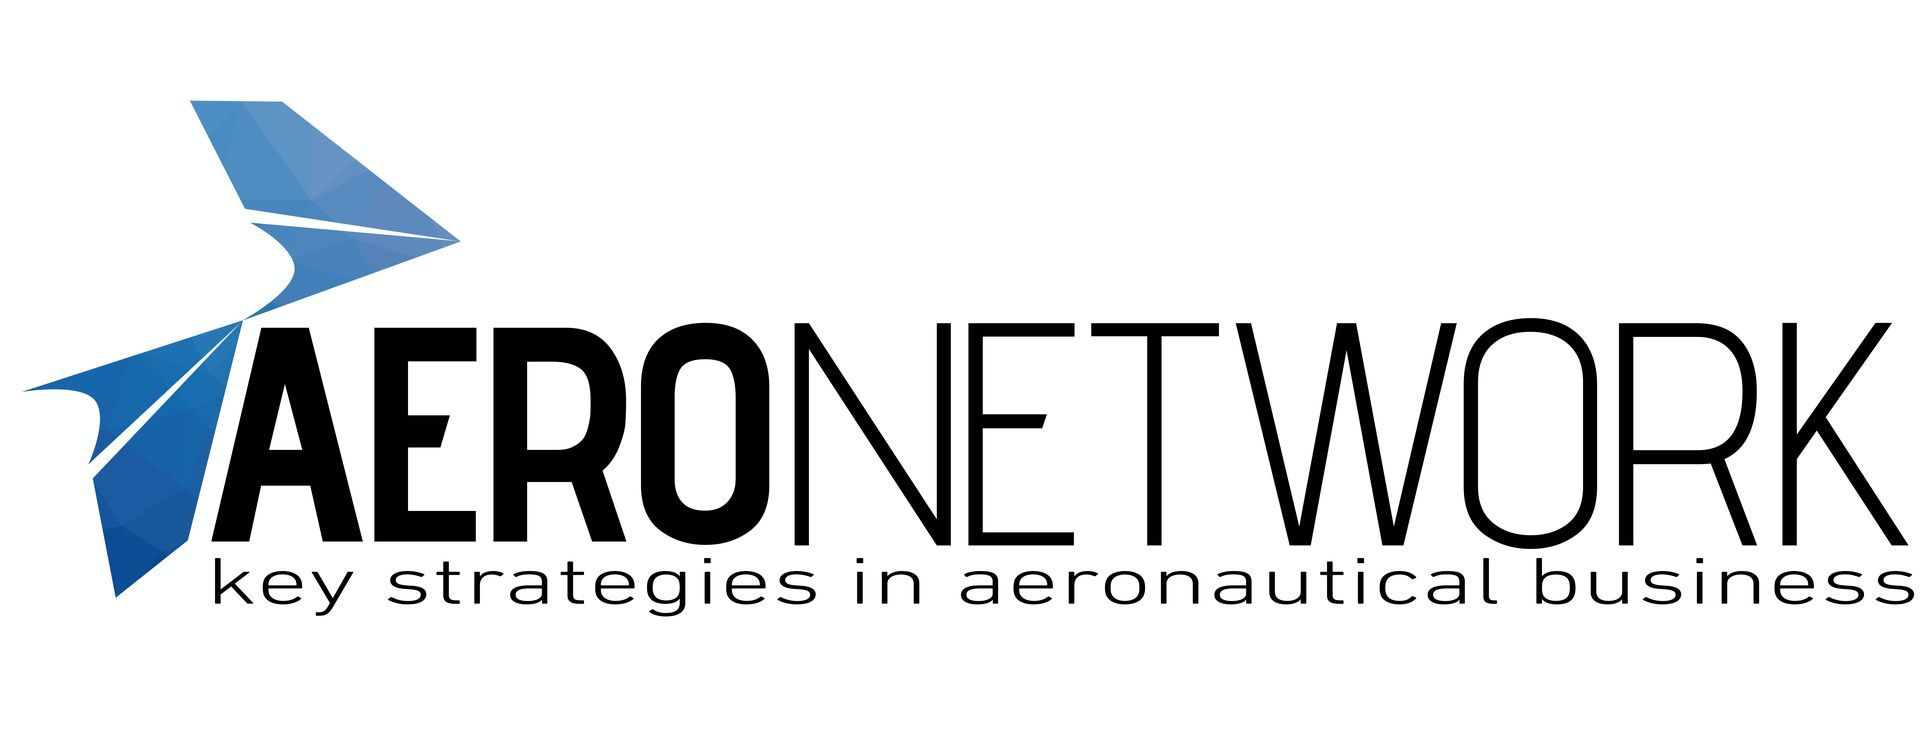 Aero Network DMI GmbH